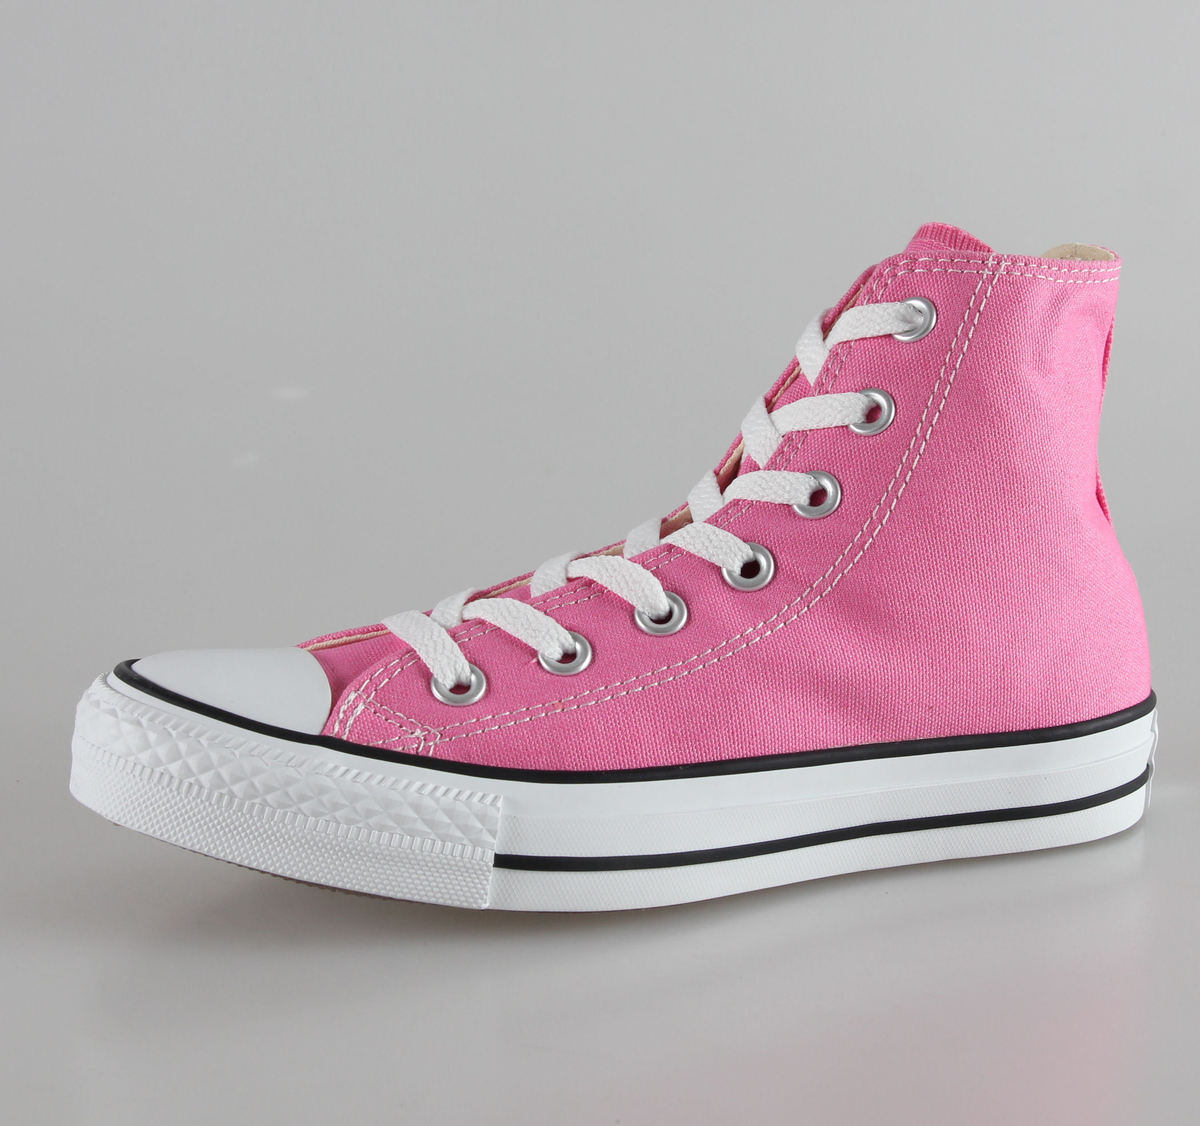 boty dámské CONVERSE - Chuck Taylor All Star - Pink - M9006